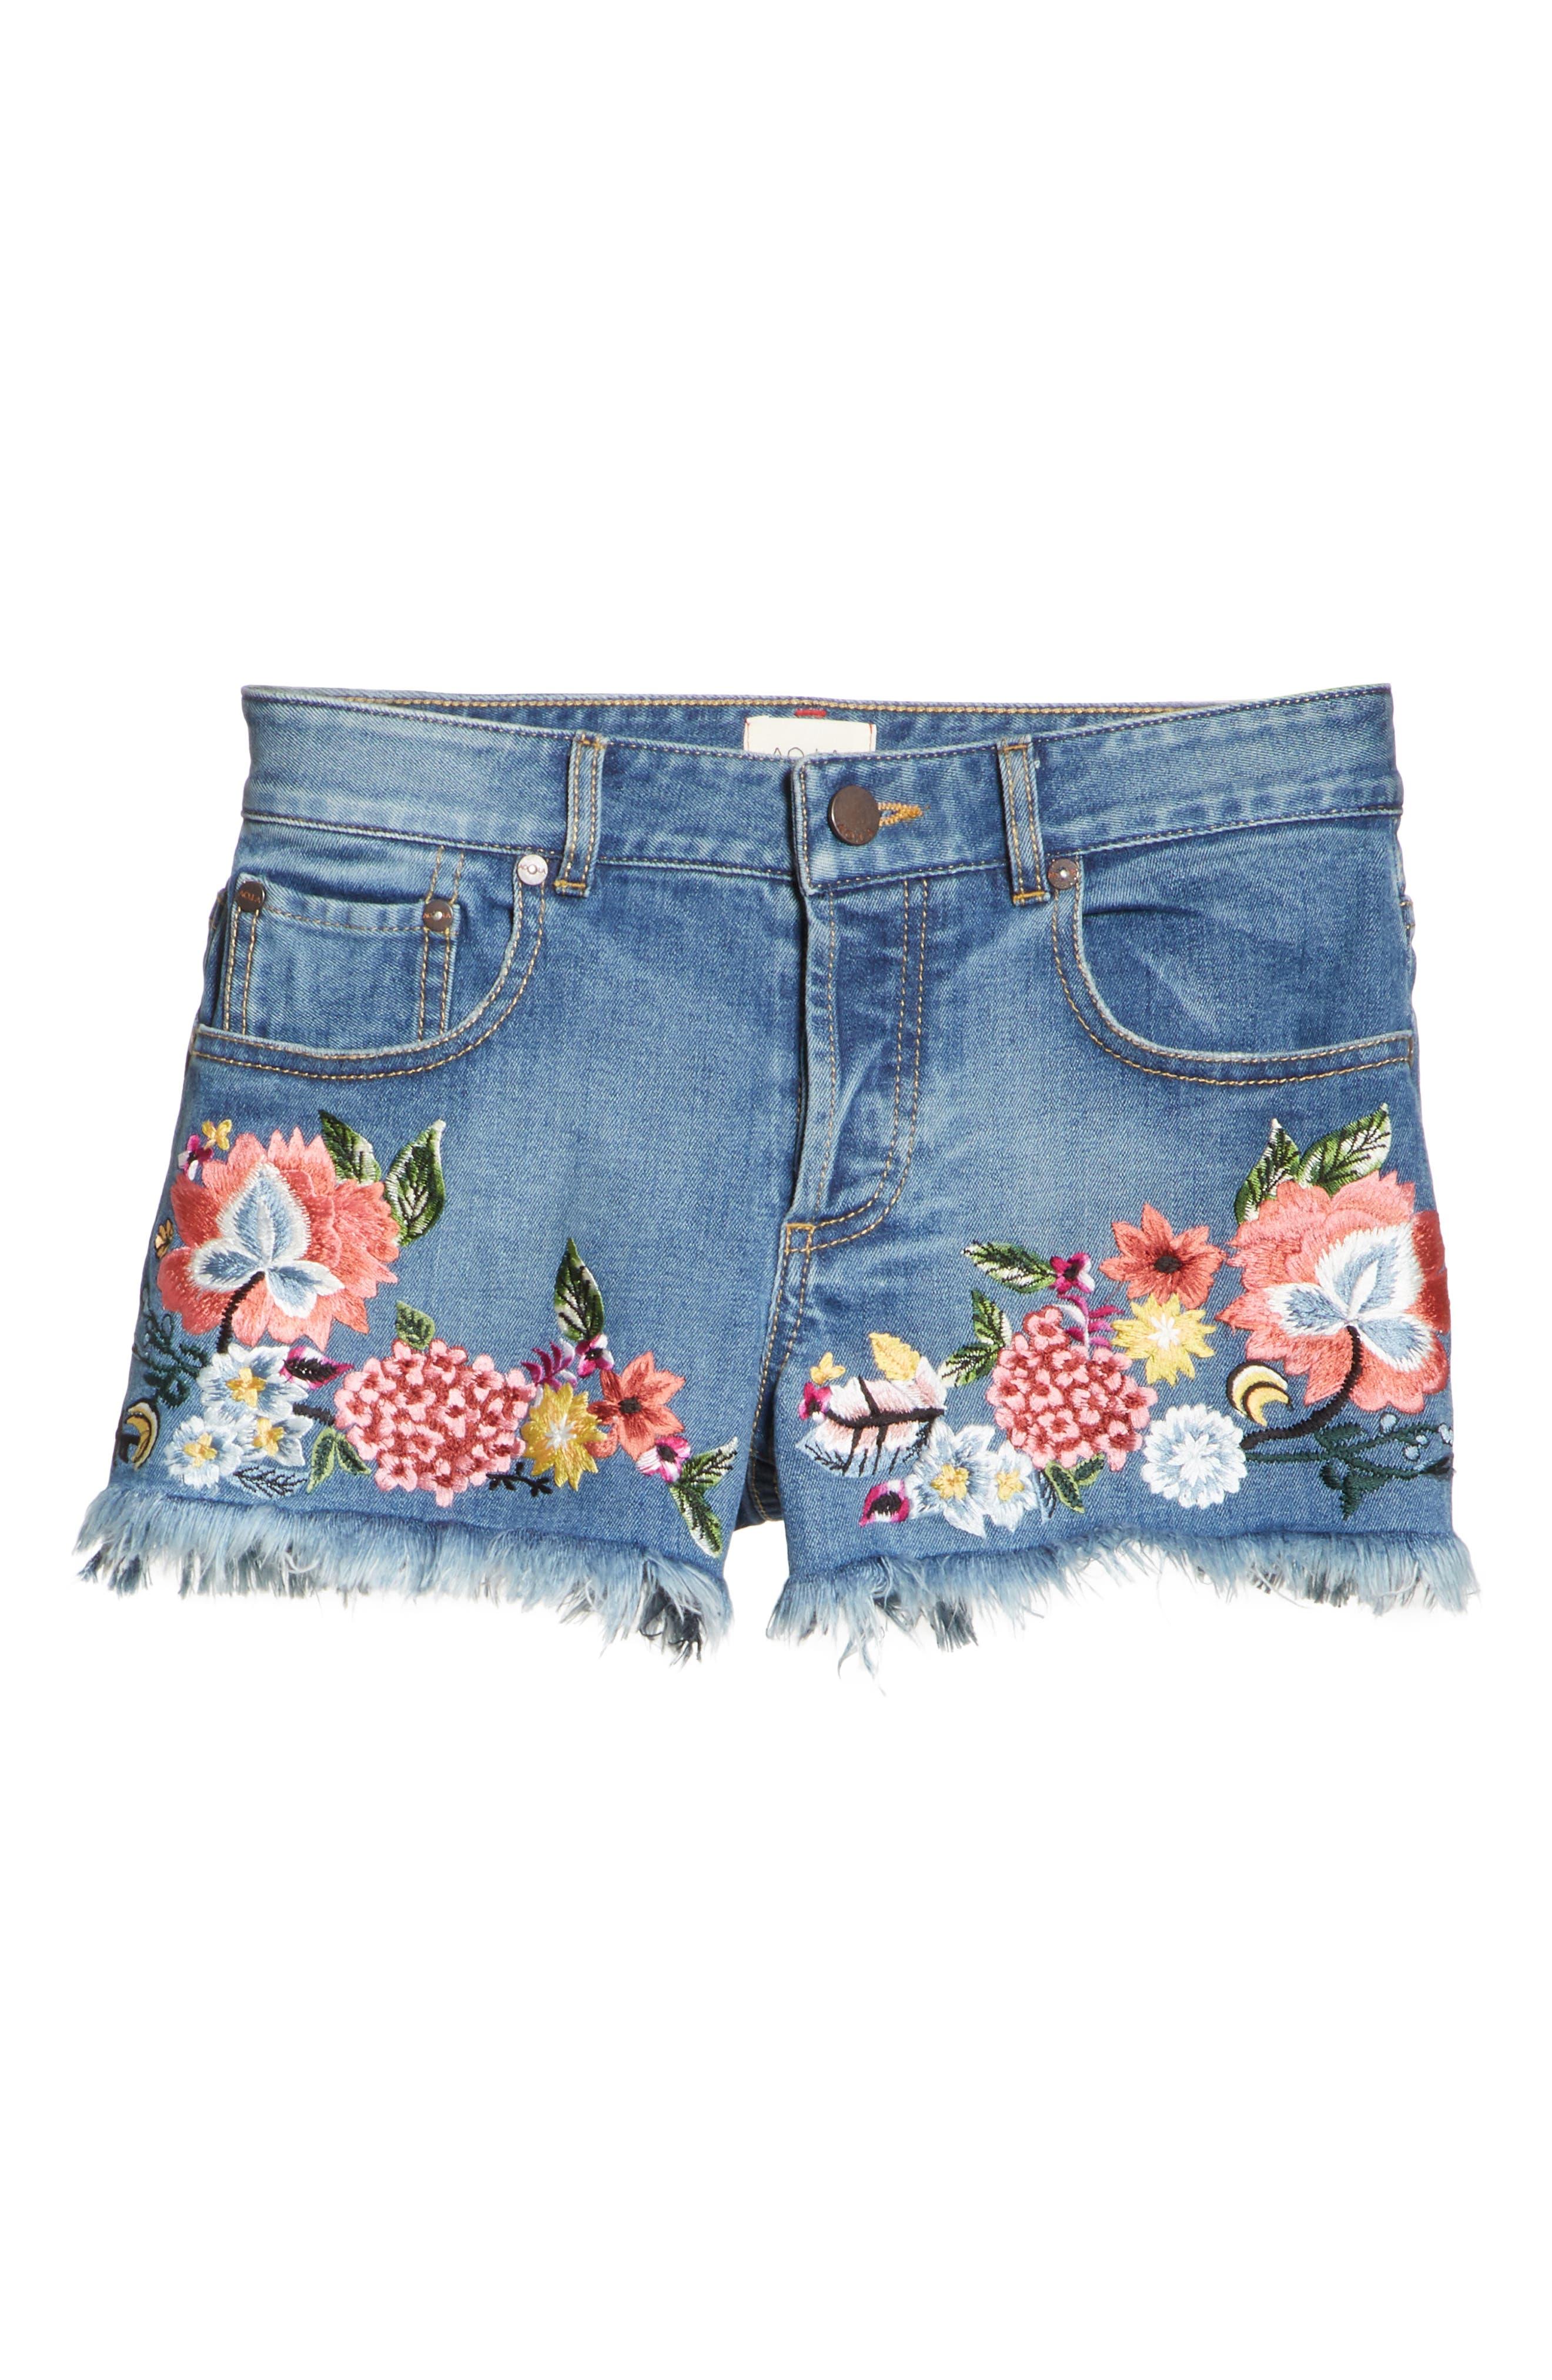 AO.LA Embroidered Denim Shorts,                             Alternate thumbnail 6, color,                             Multi